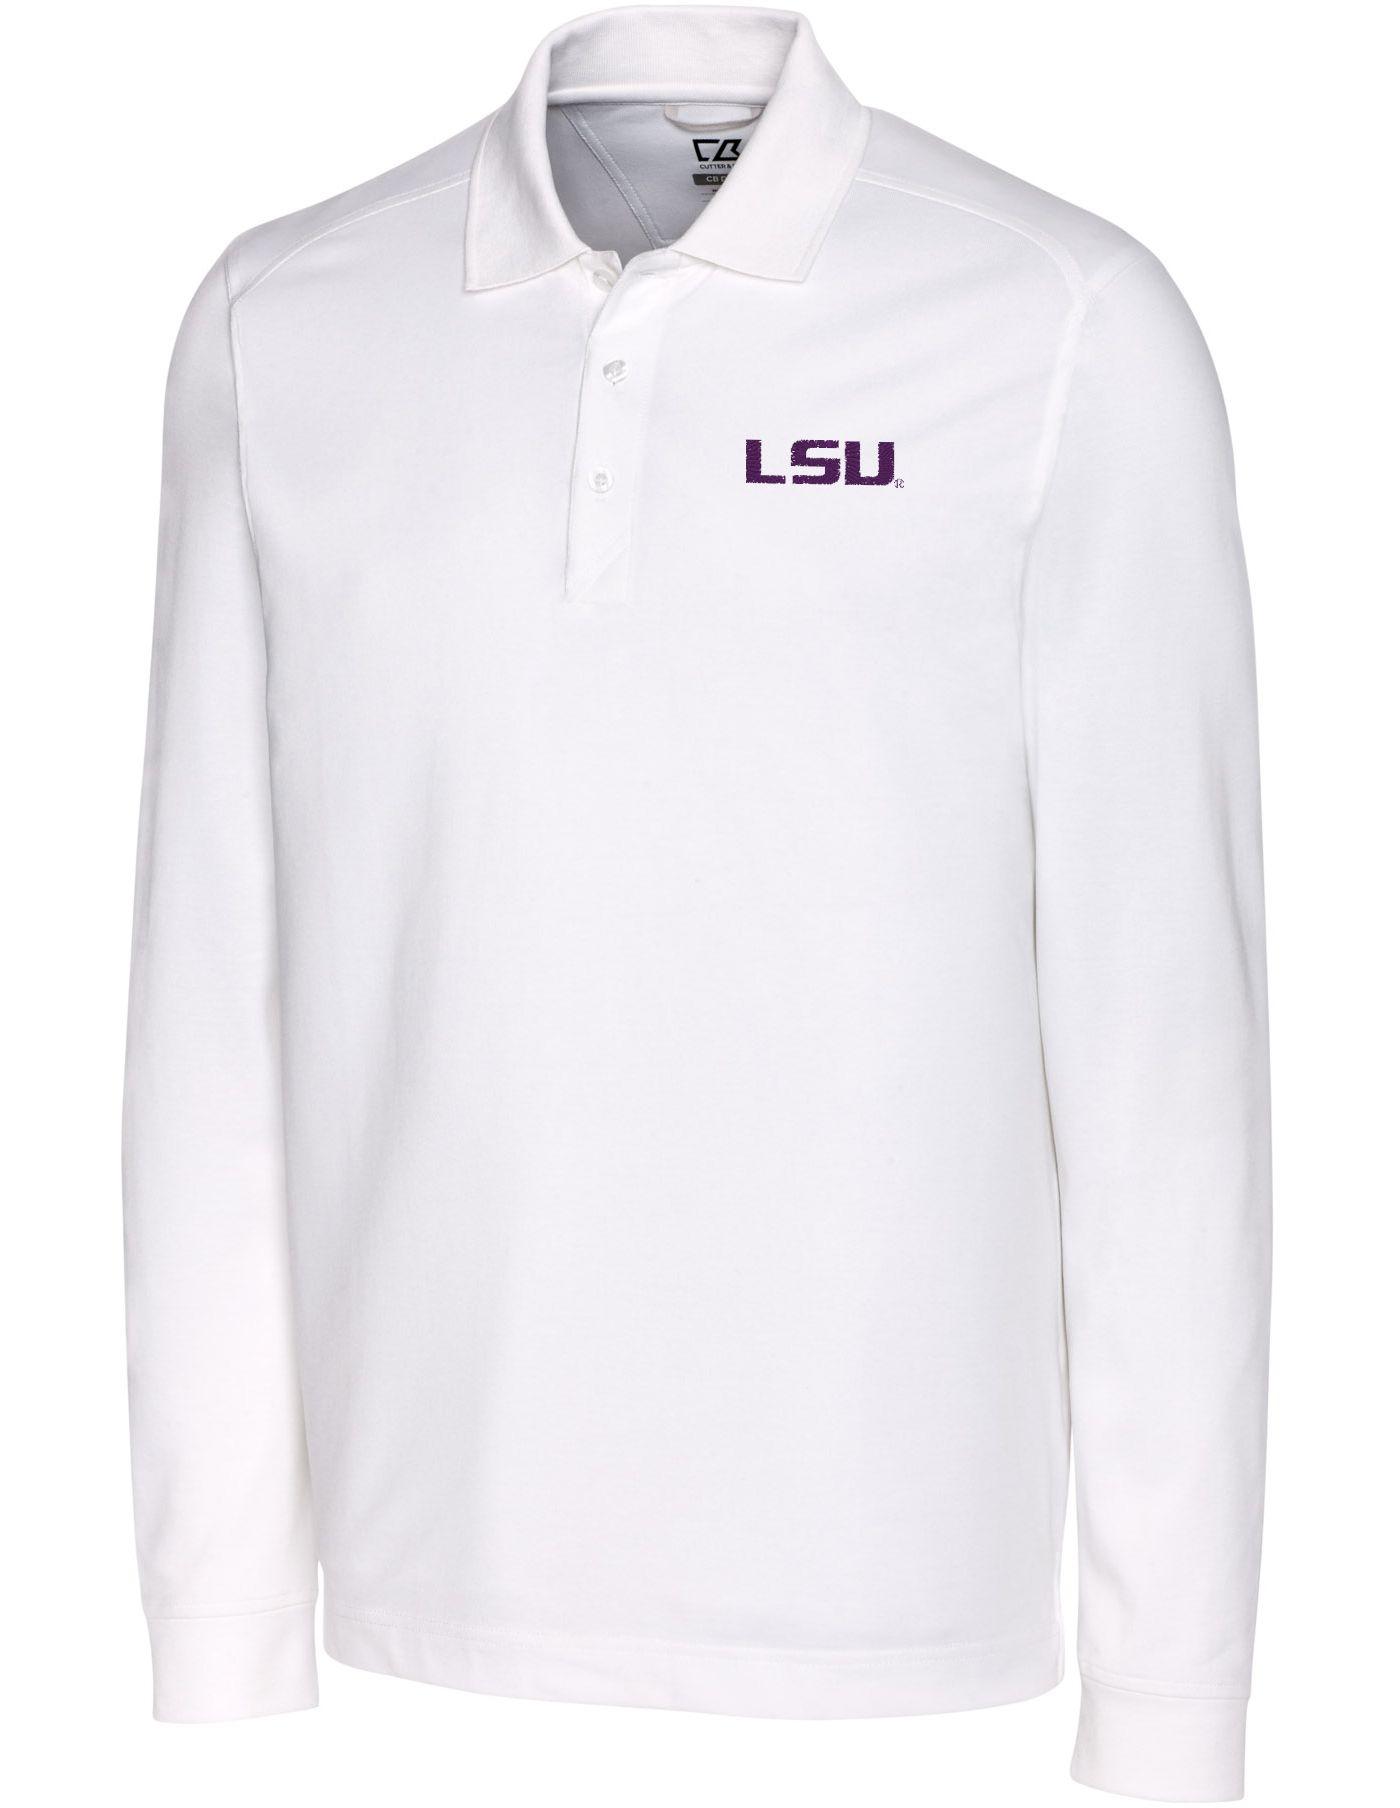 Cutter & Buck Men's LSU Tigers Advantage Long Sleeve White Polo